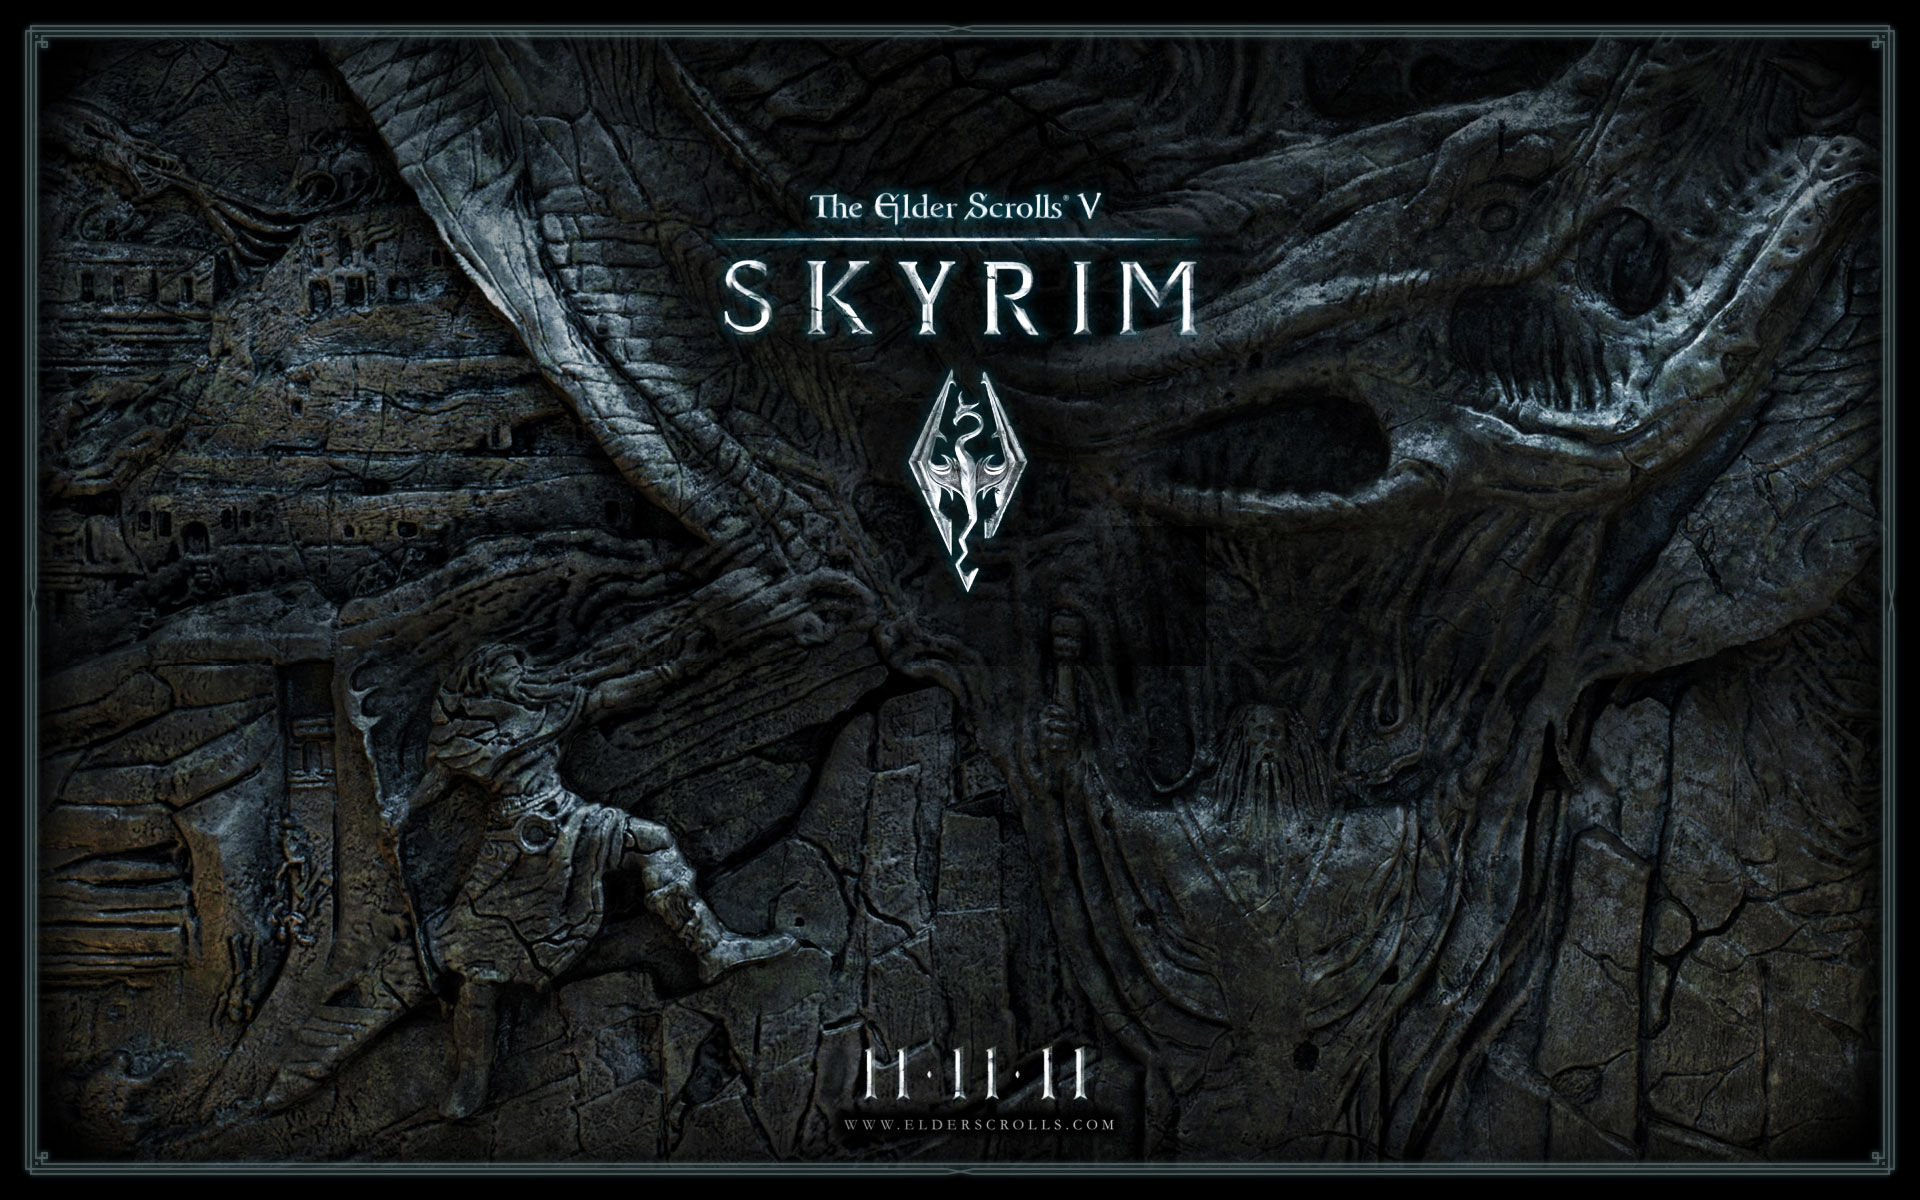 The Elder Scrolls V: Skyrim Fiche RPG (reviews, Previews